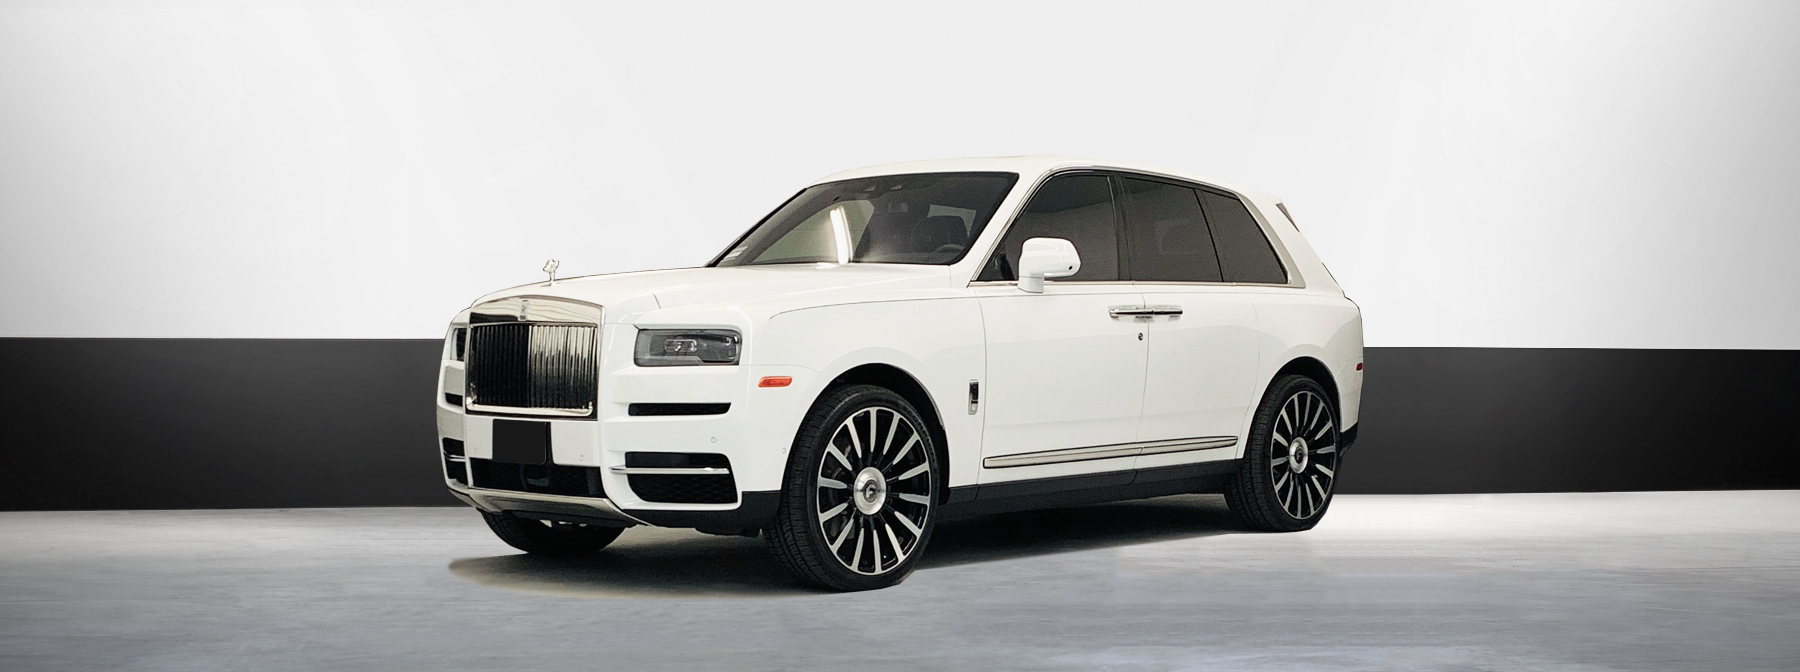 Rolls Royce suv rental Cullinan in white